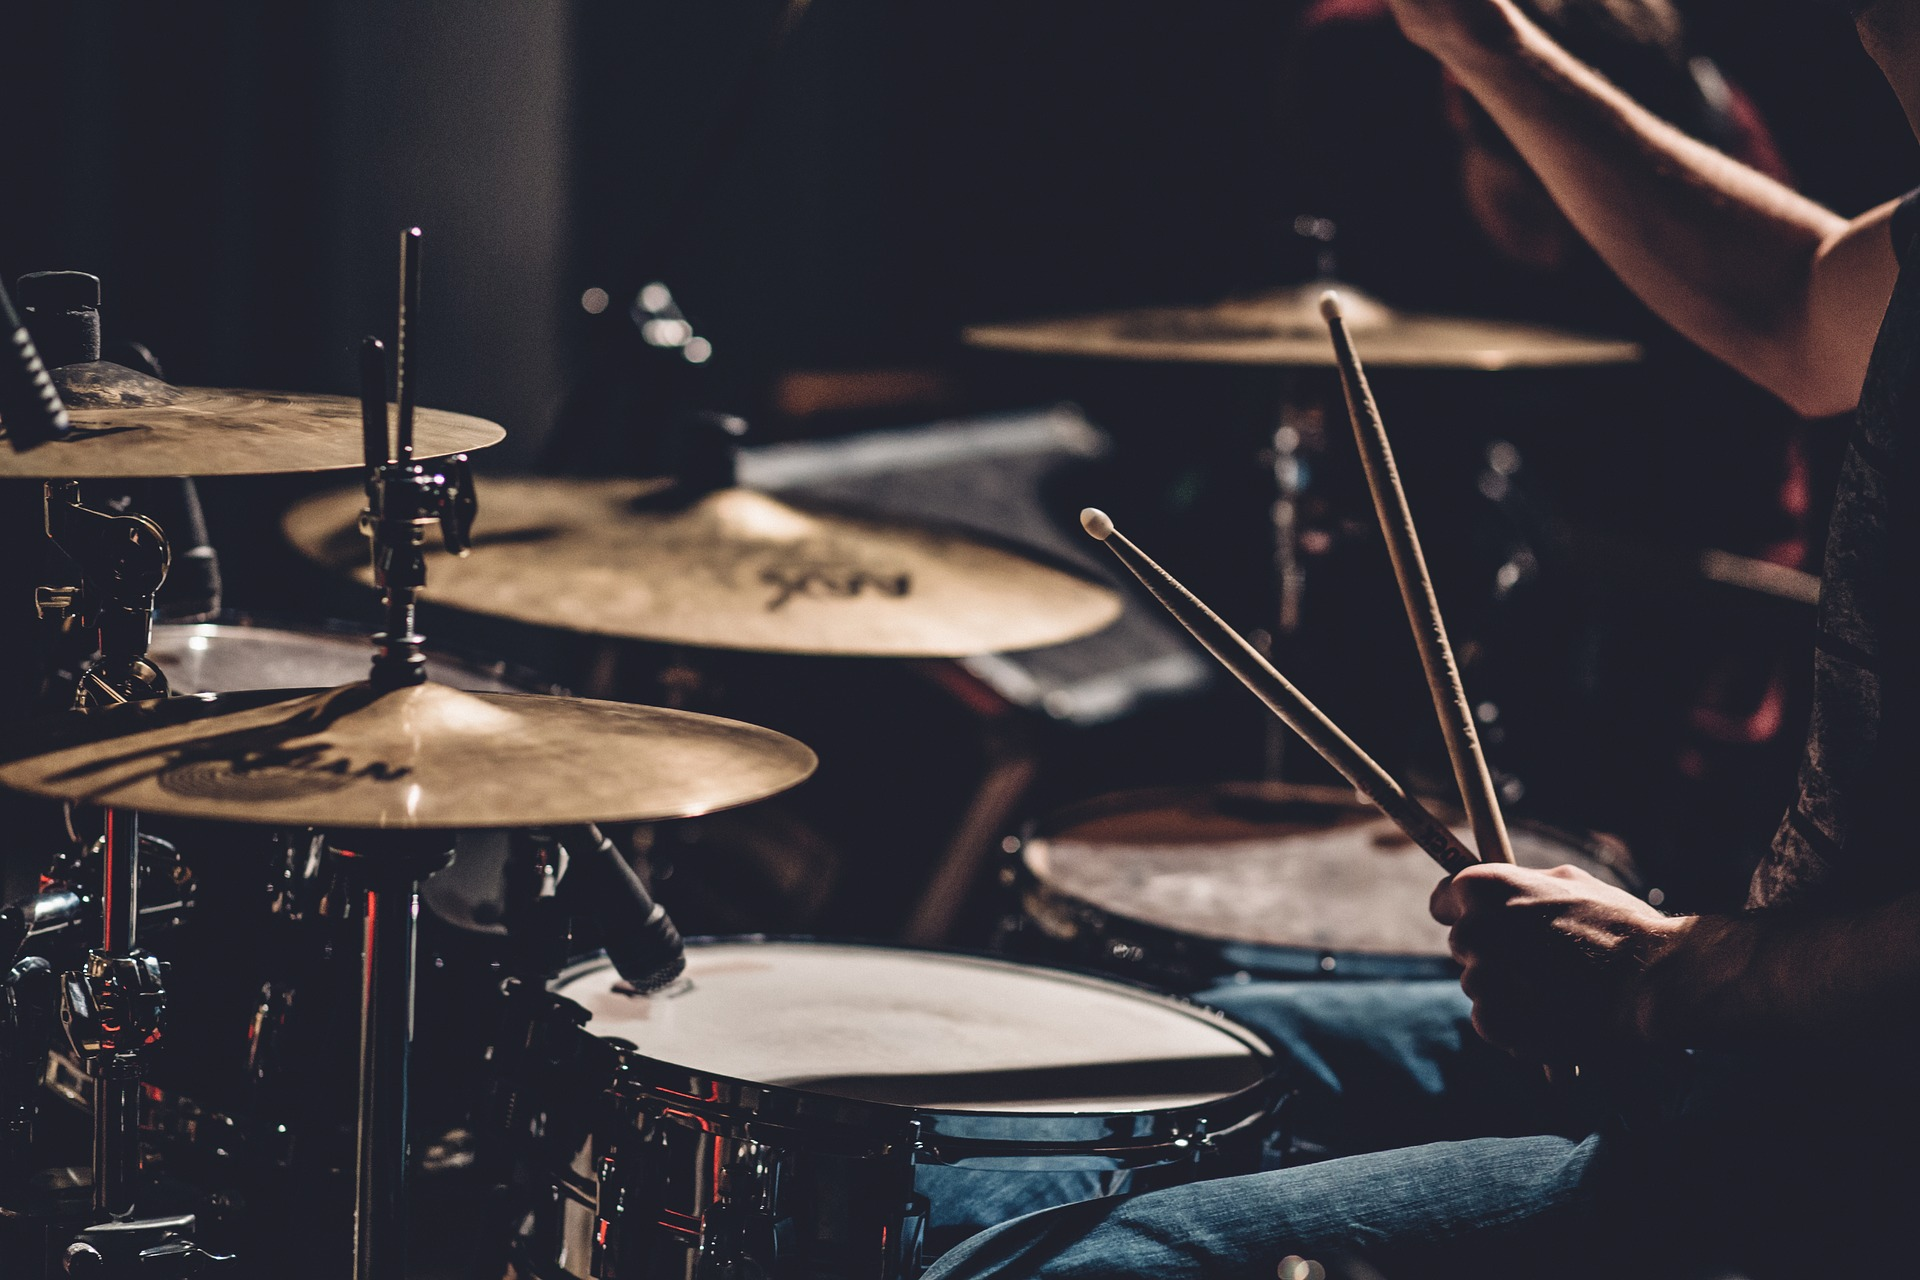 Drum set with drumsticks